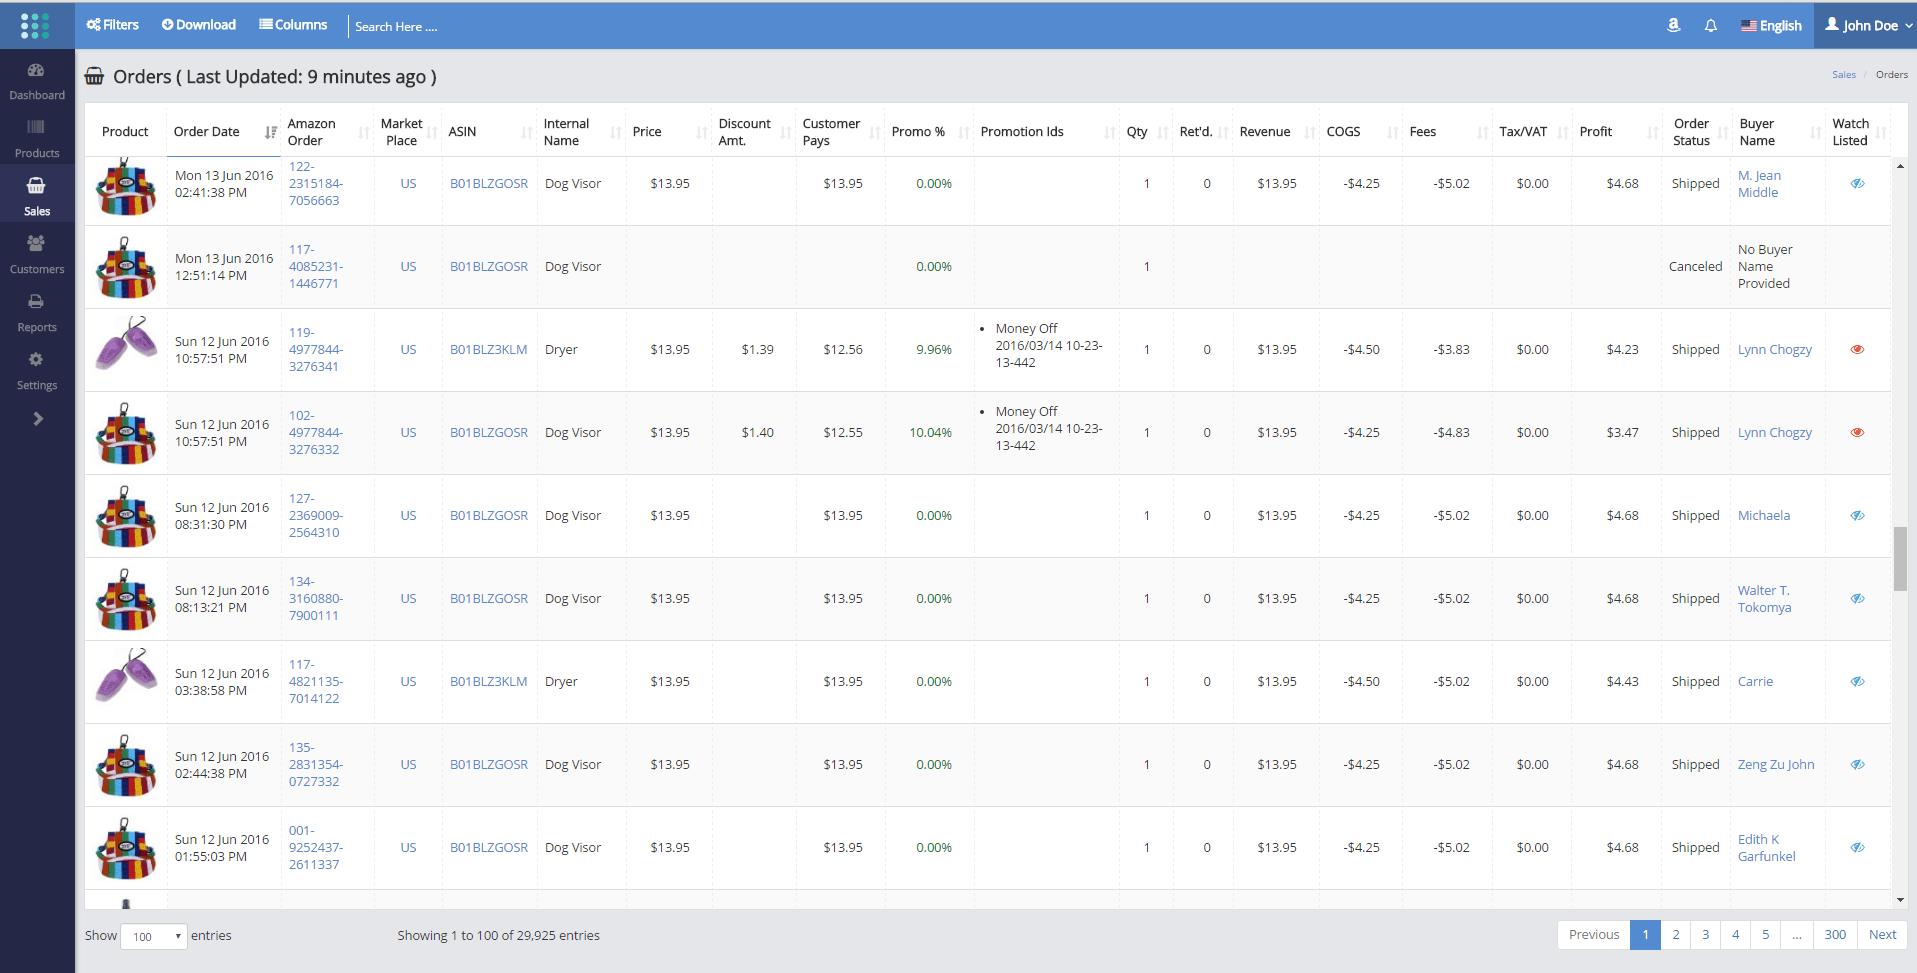 Sellerlegend real time data